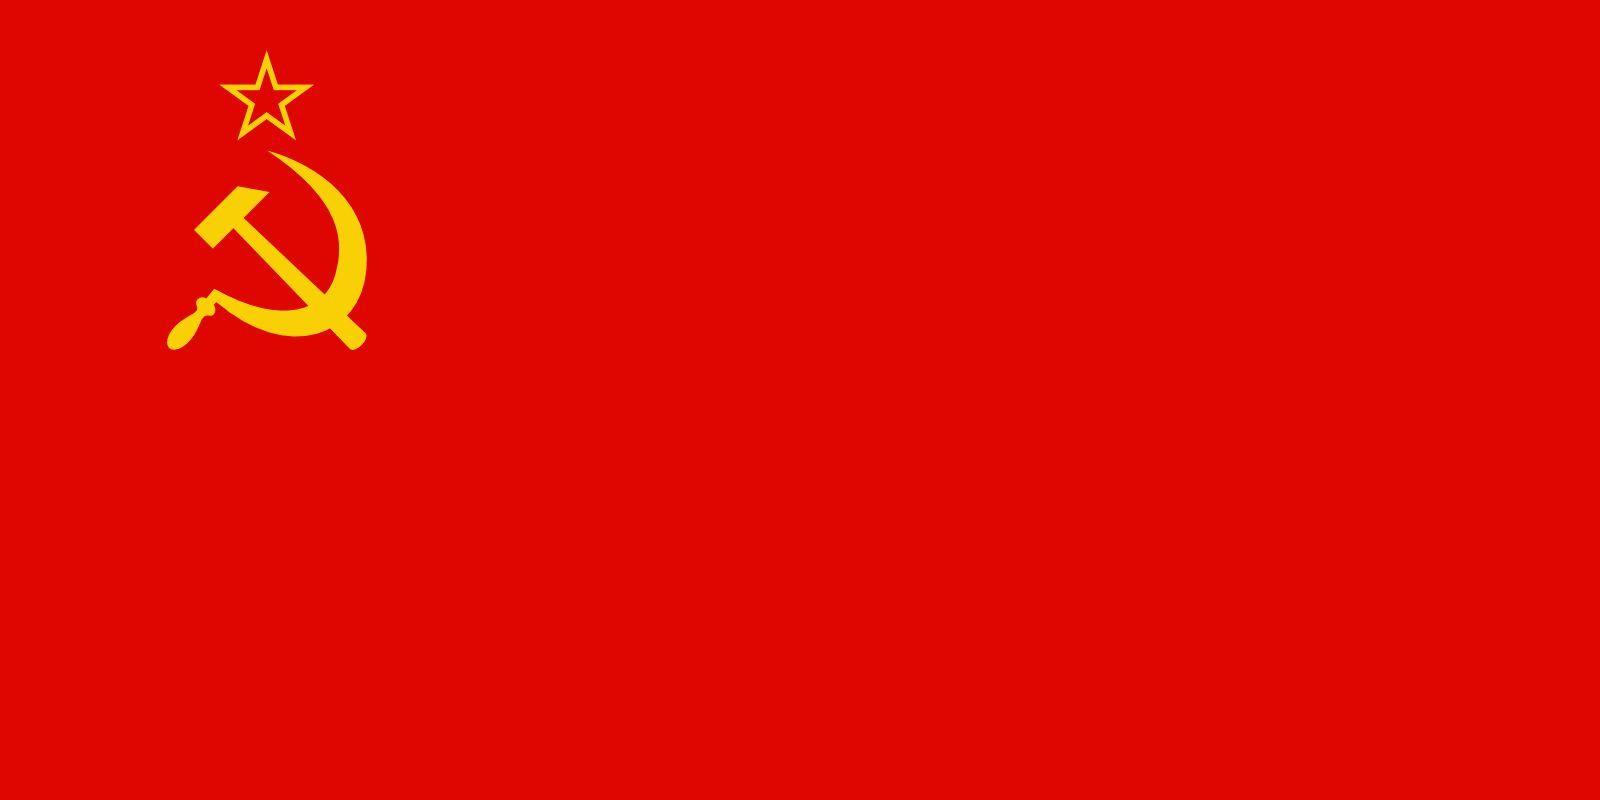 La extinta Unión Soviética